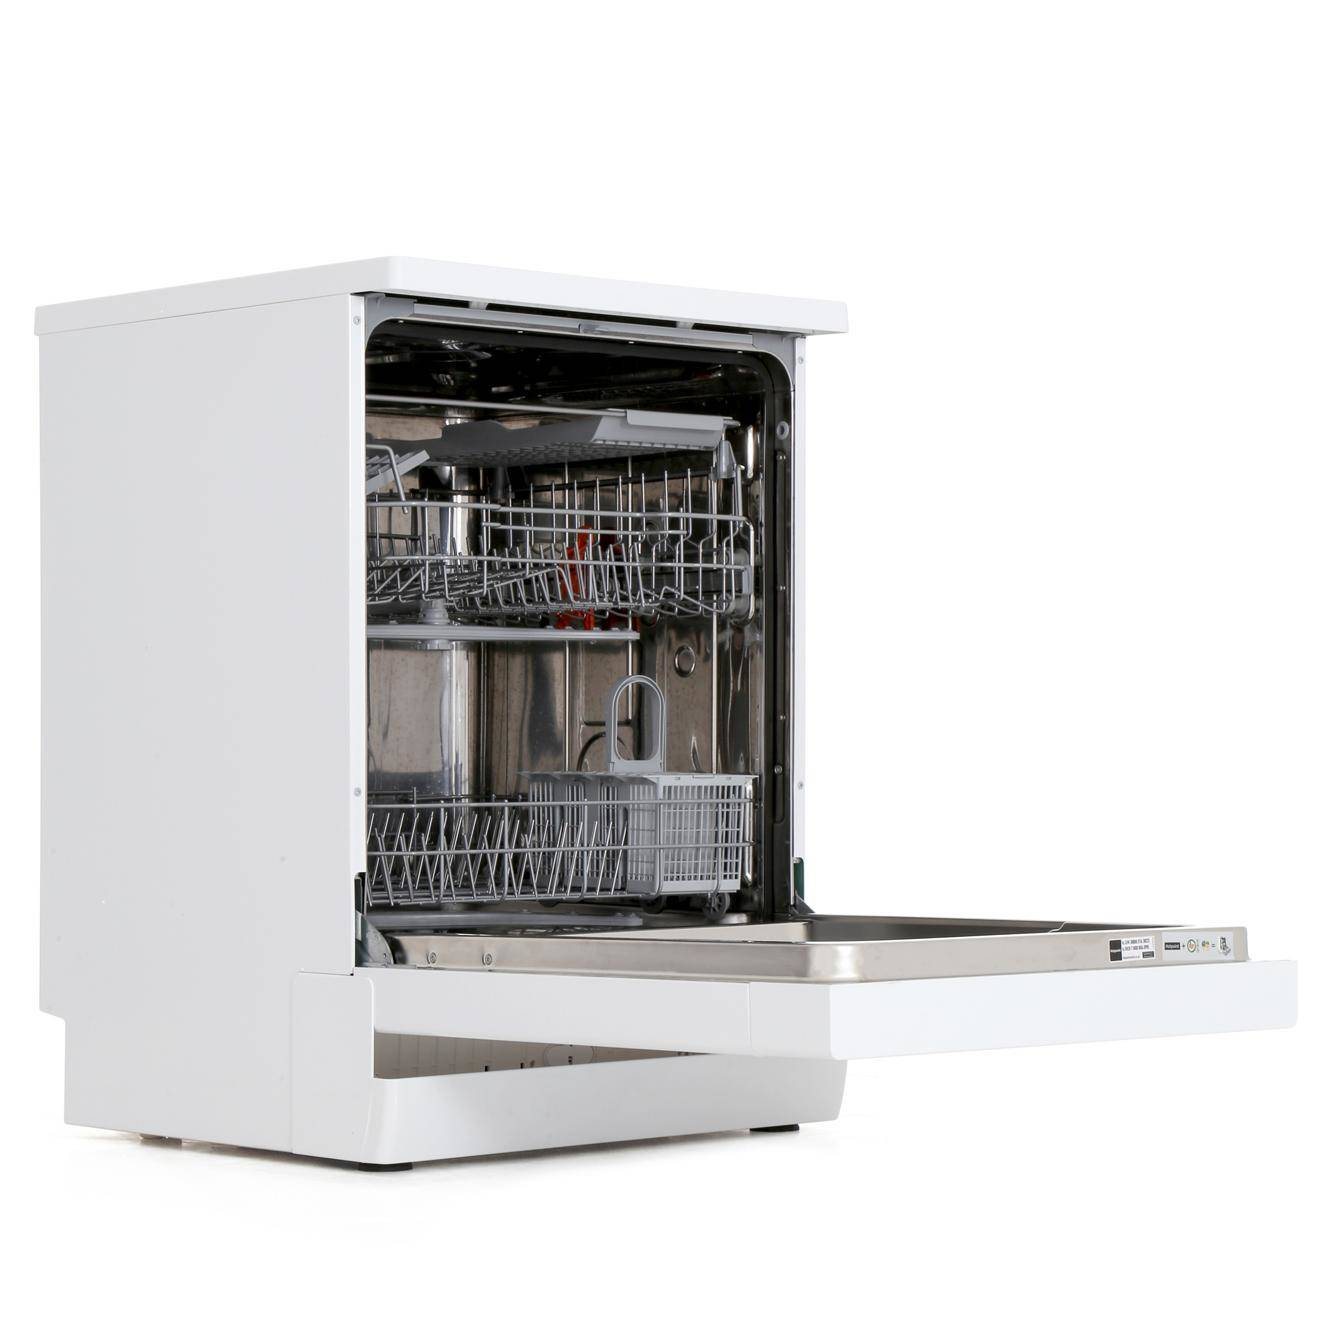 Hotpoint HEFC2B19C Dishwasher 13 Place Settings